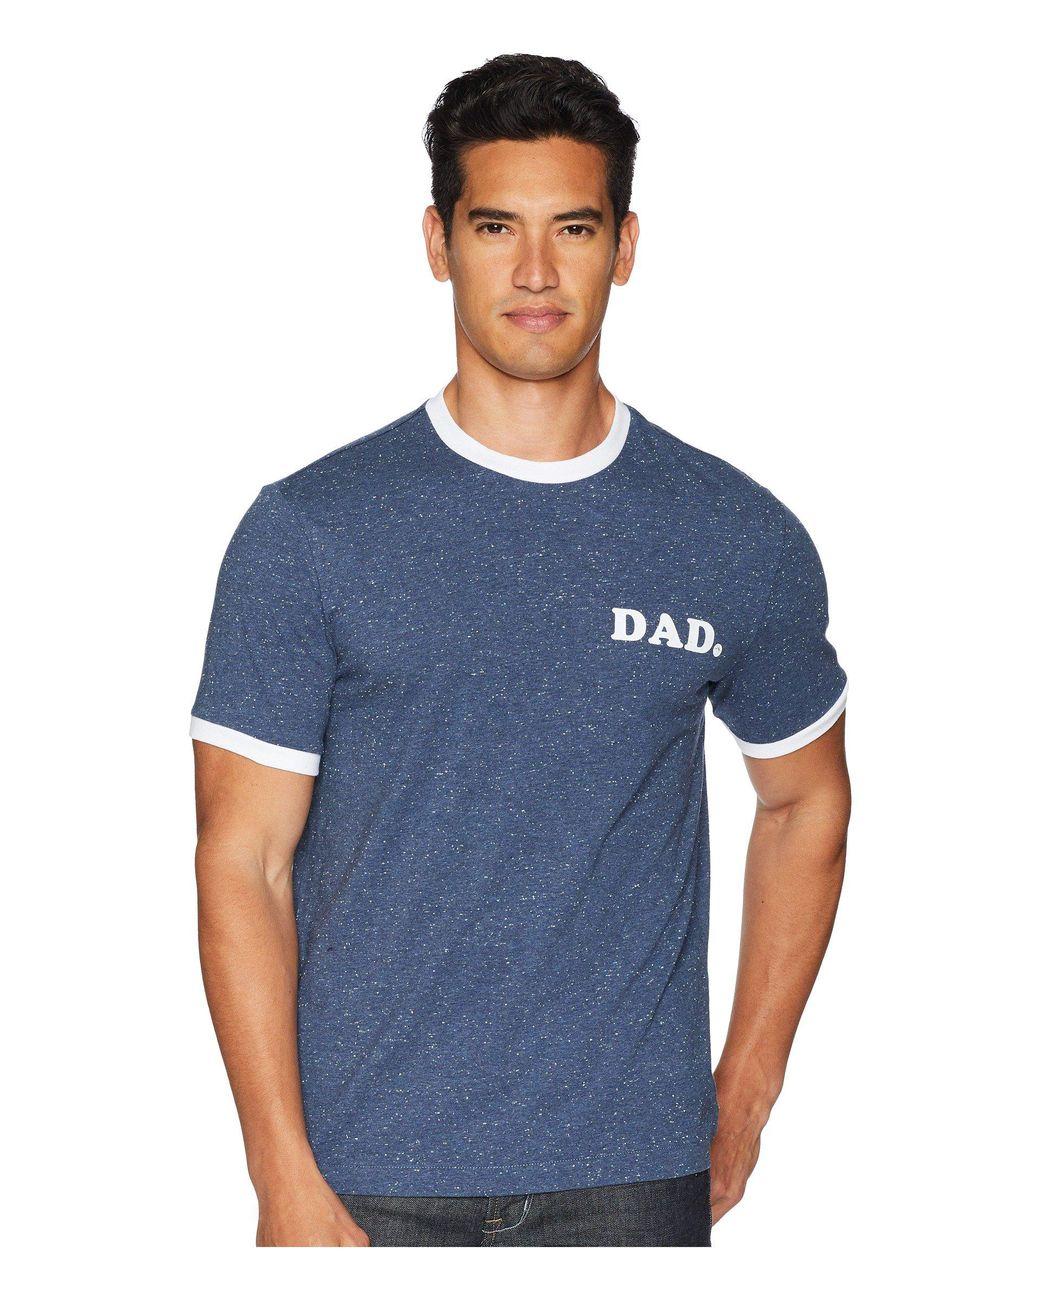 83c137eca6b44 Lyst - Original Penguin Short Sleeve Dad Ringer T-shirt (vintage ...